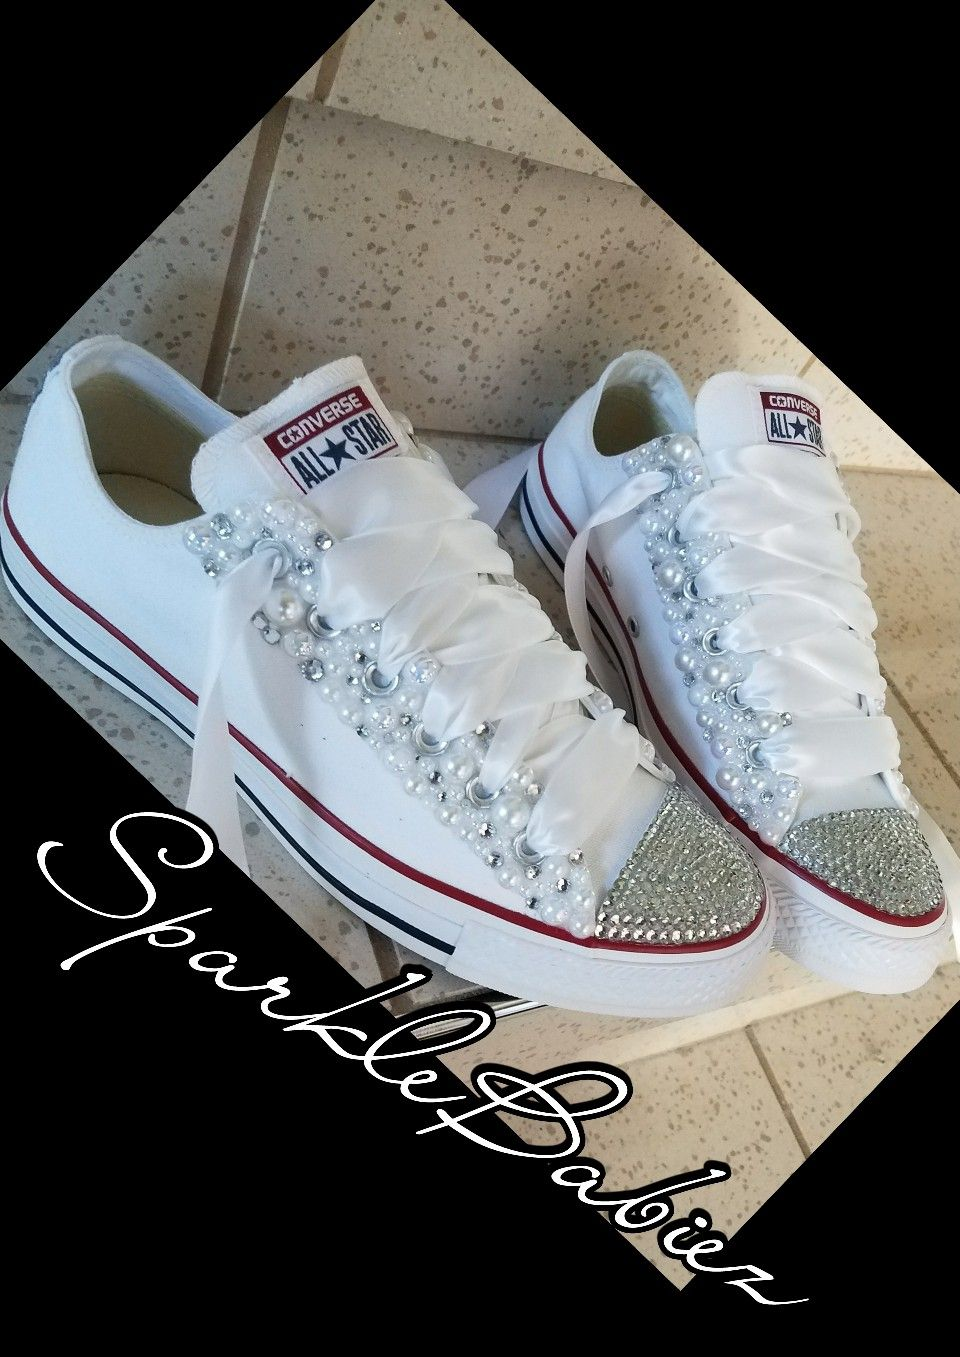 e4f08d168a5 Bling & Pearl Chuck Taylor All Star Converse Wedding Bridal Shoes ...